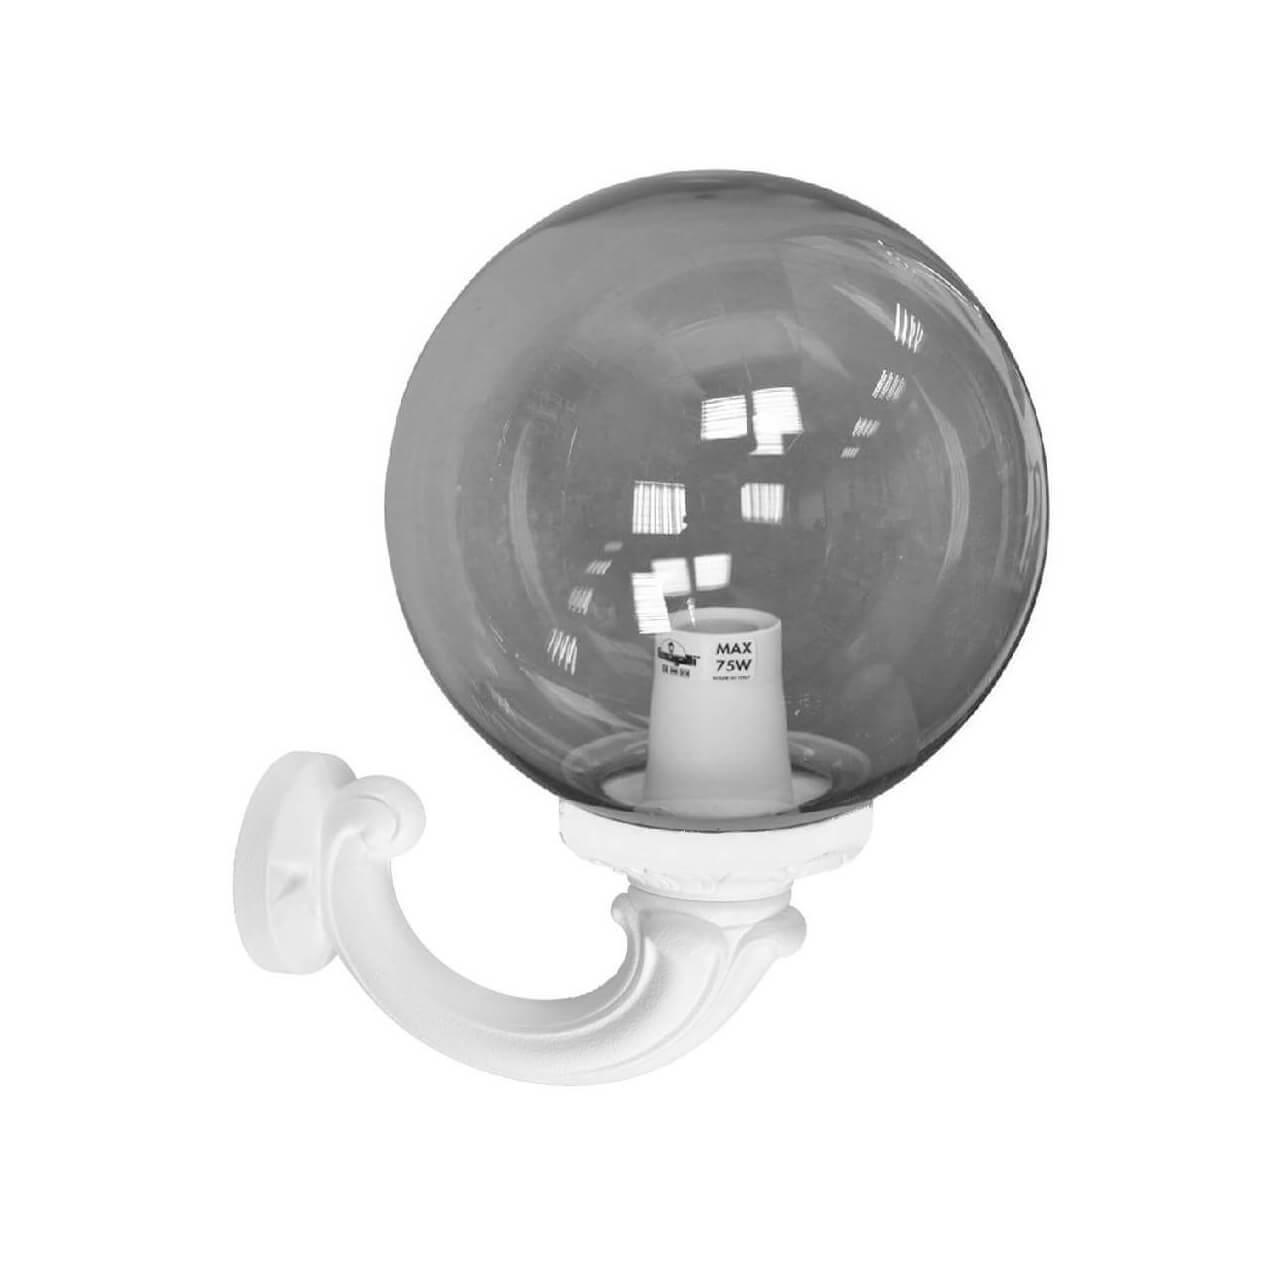 Светильник Fumagalli G30.132.000.WZE27 Ofir/G300 цена 2017